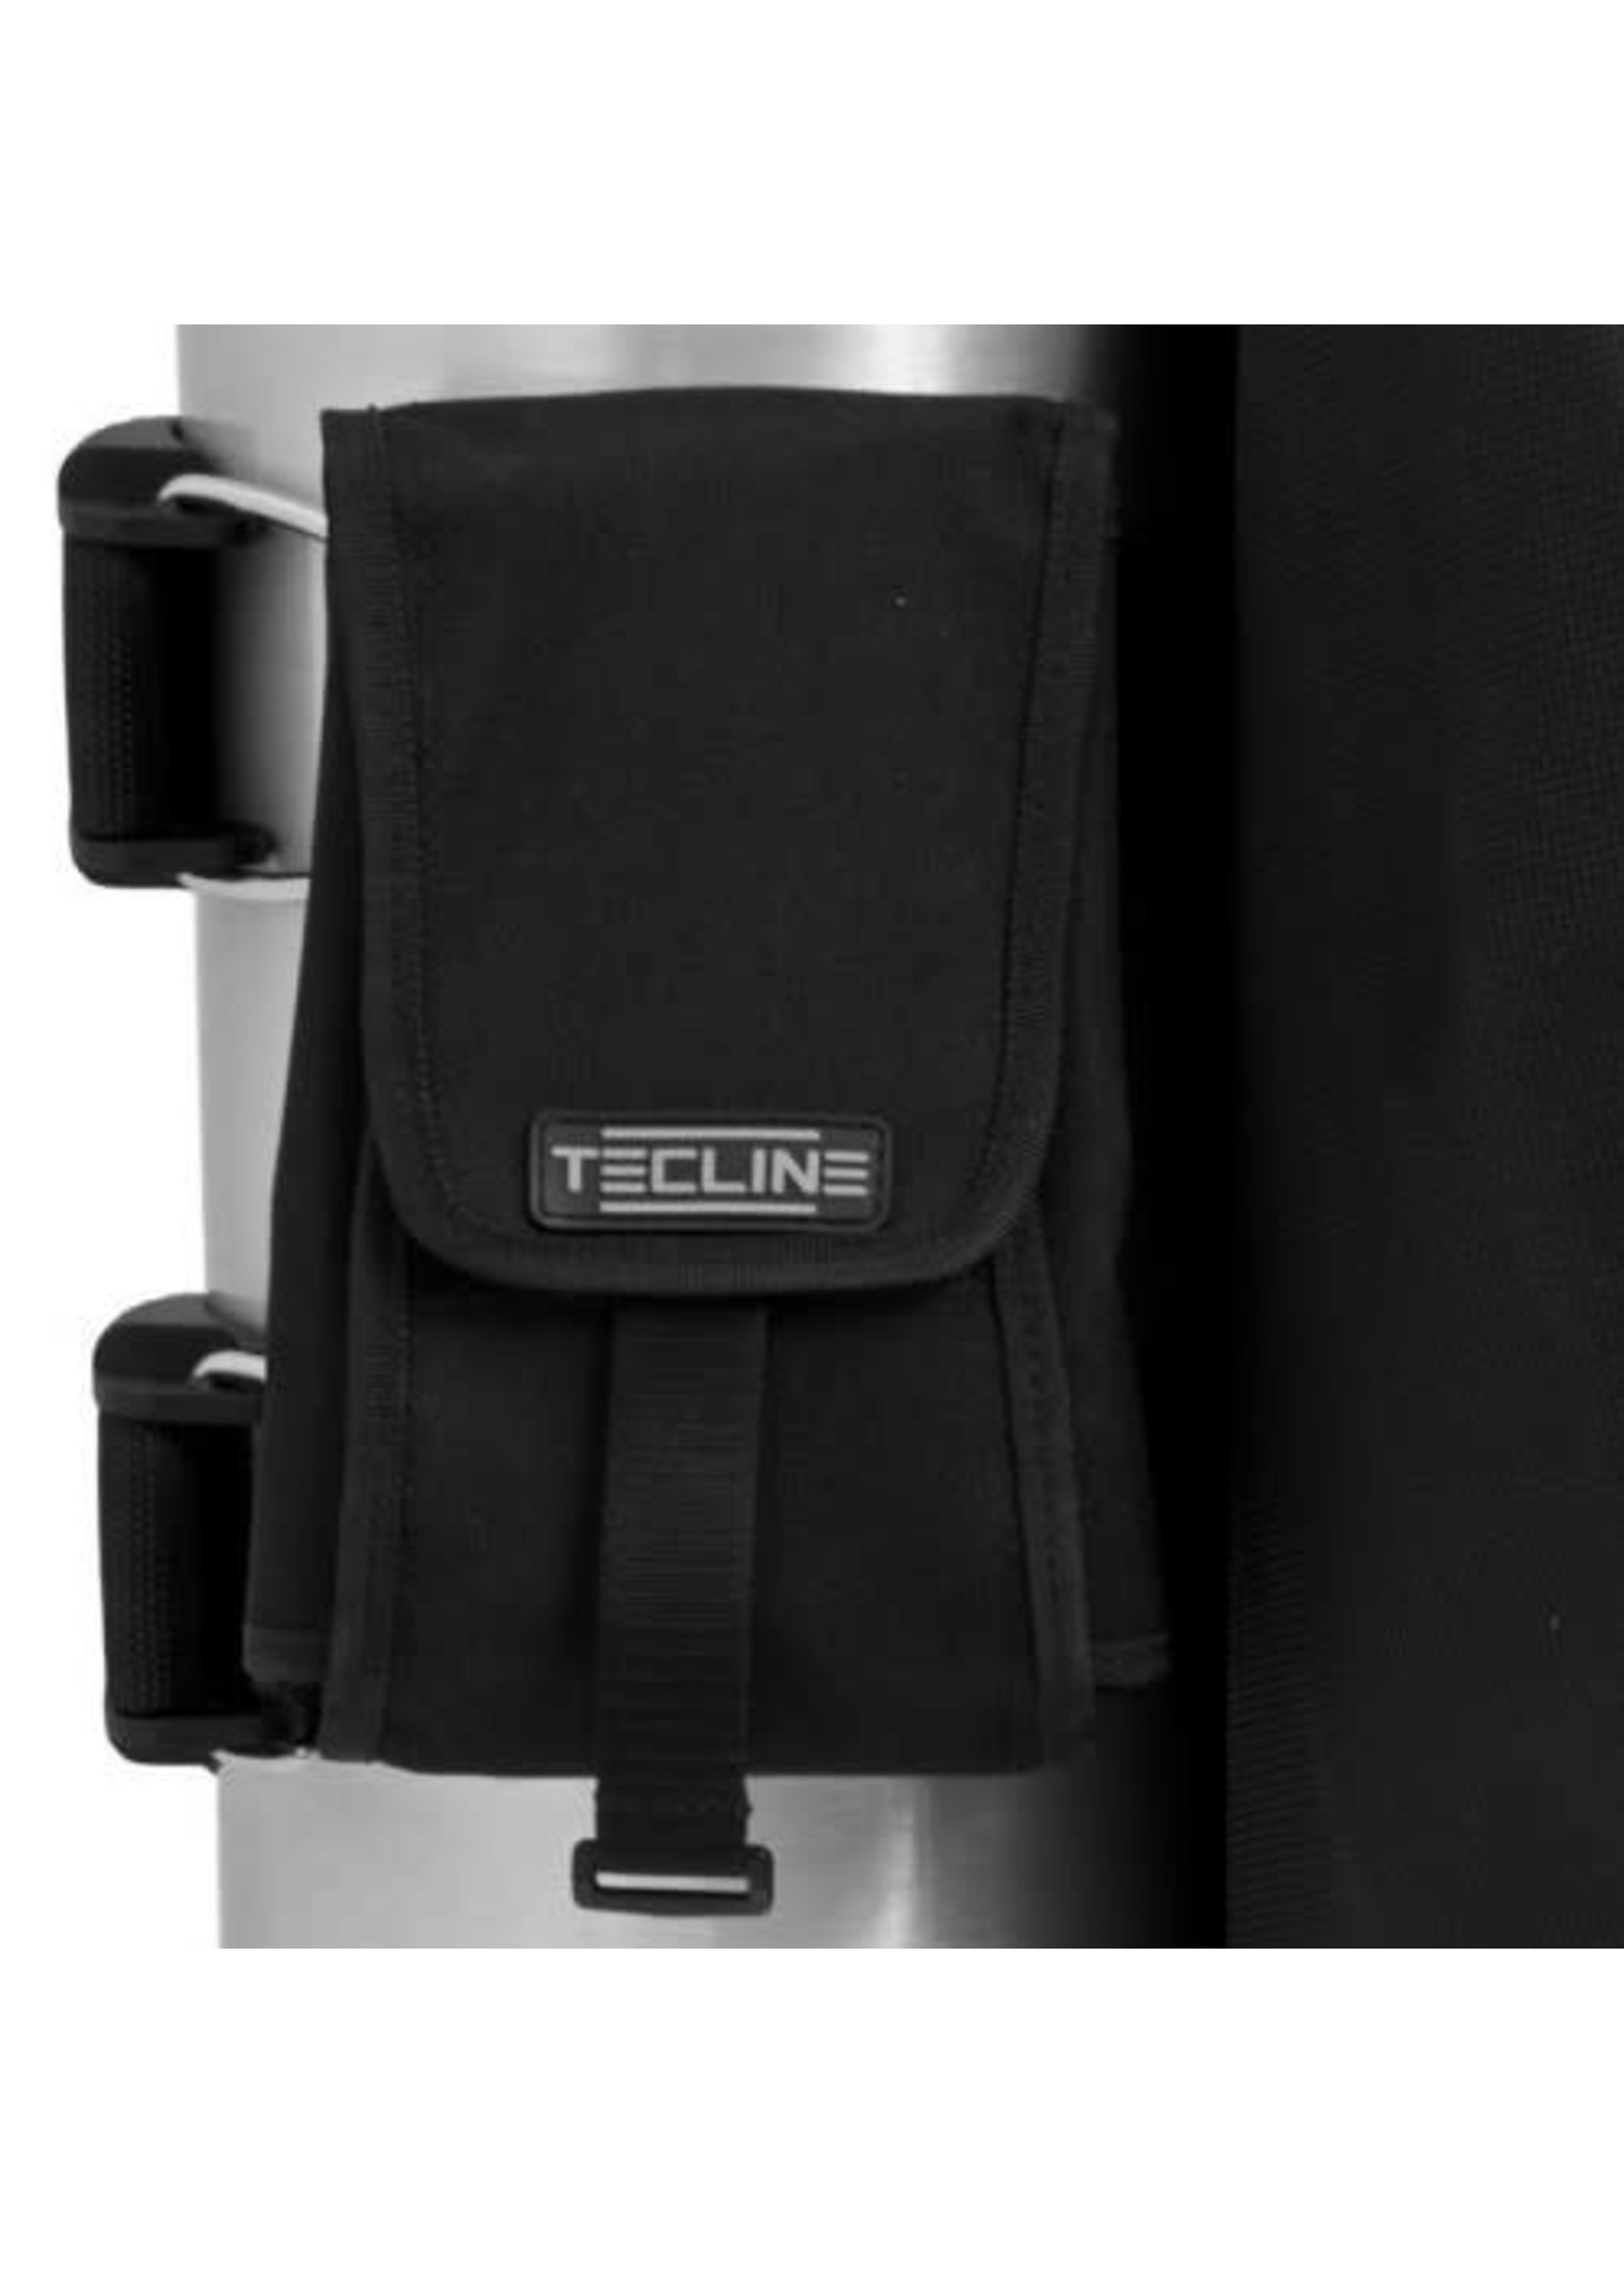 TecLine Tecline Trim pockets - diverse varianten